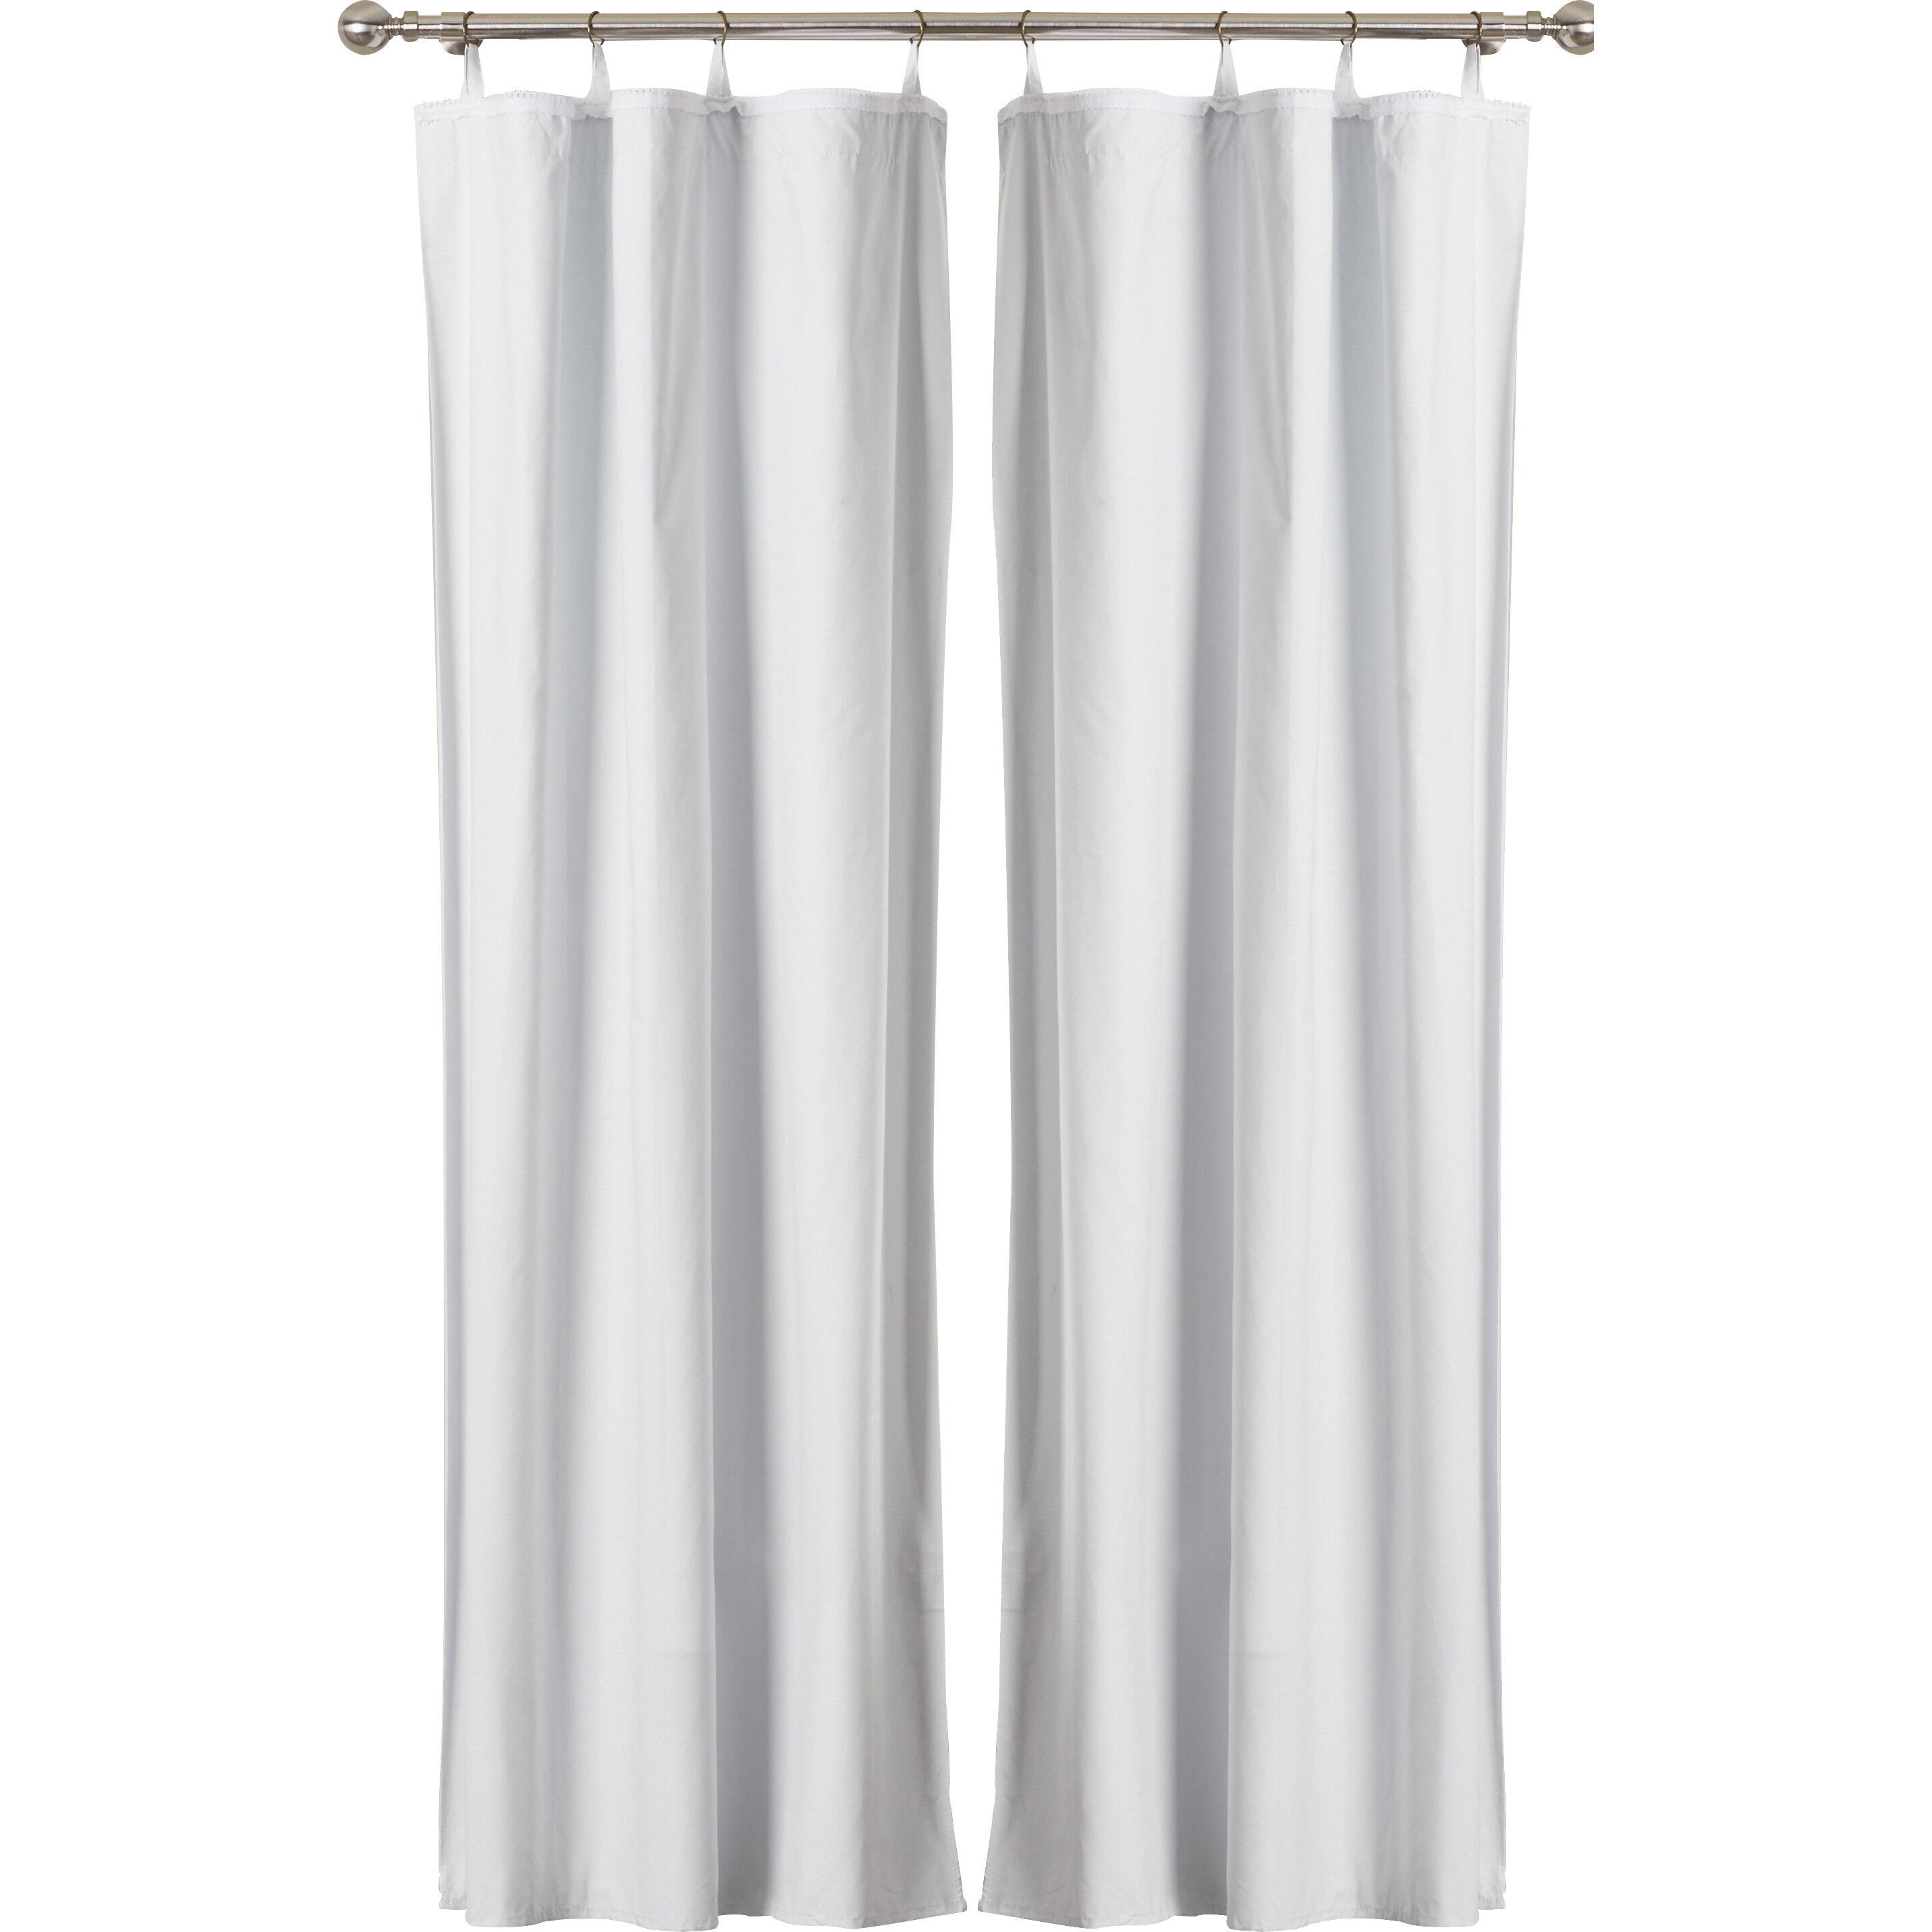 Alcott Hill Dorset Panel Curtain Liner & Reviews